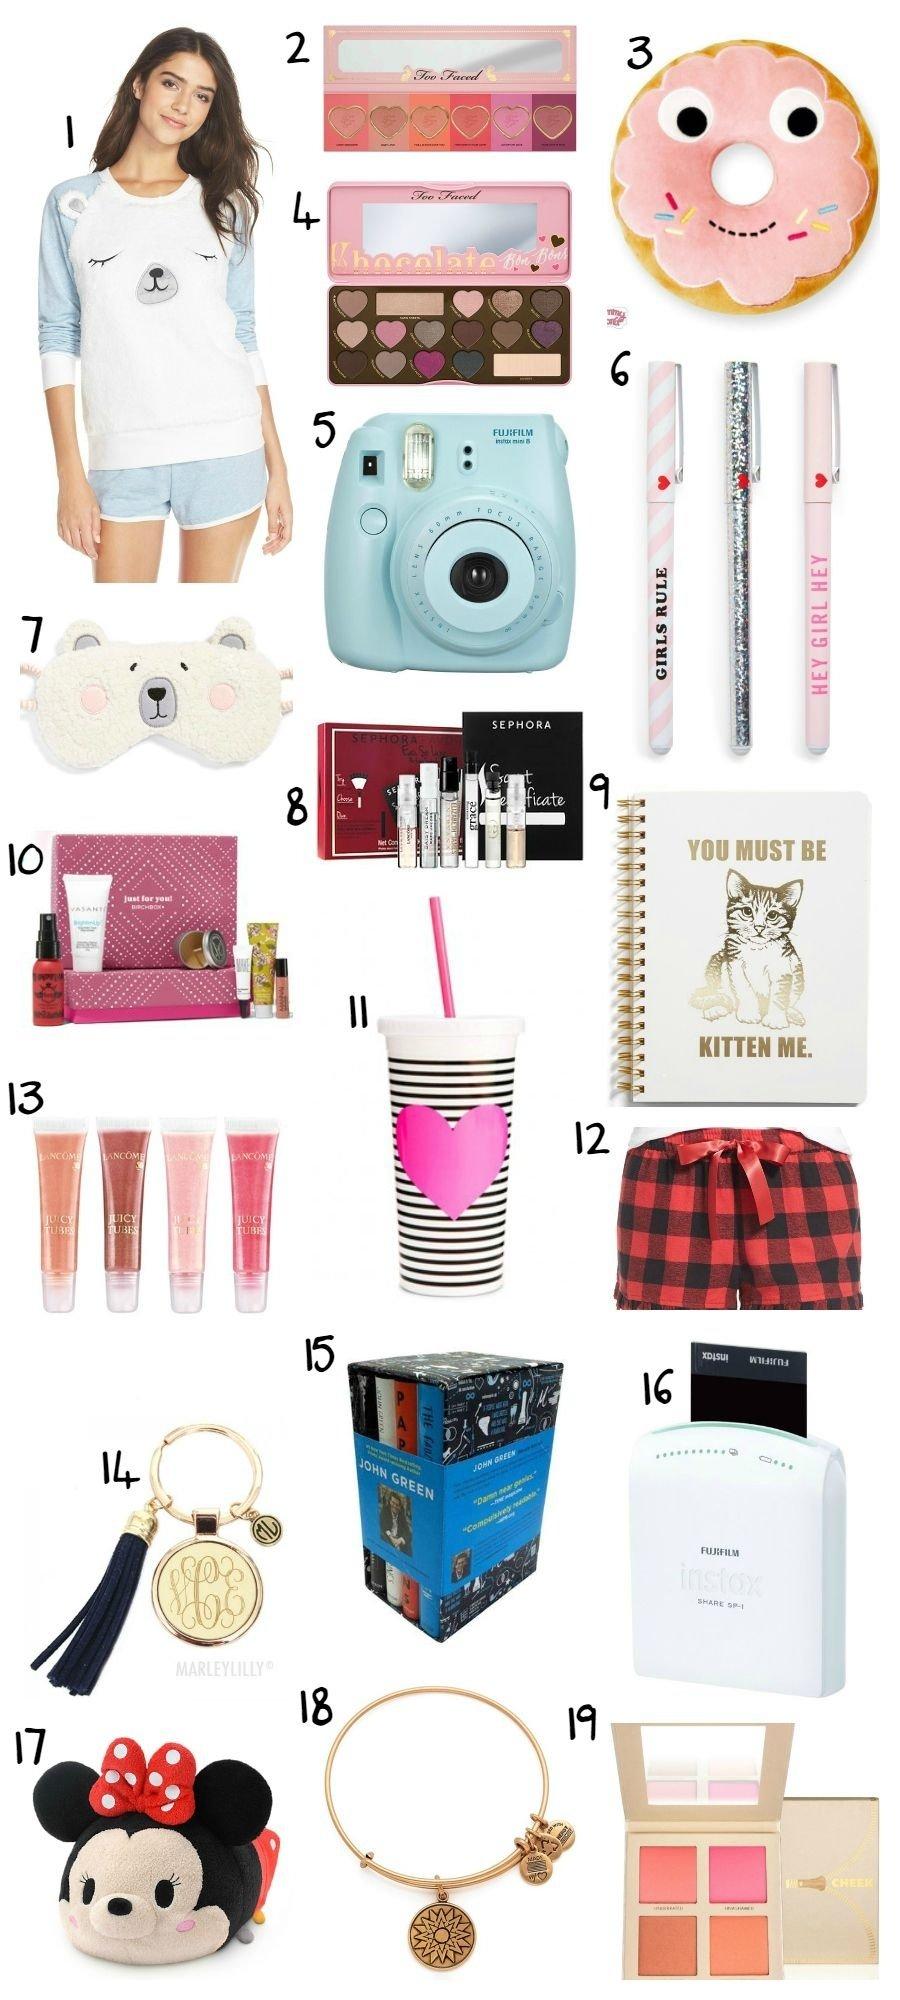 10 Wonderful Christmas Ideas For Tween Girls best christmas gift ideas for teens ashley brooke christmas gift 16 2020